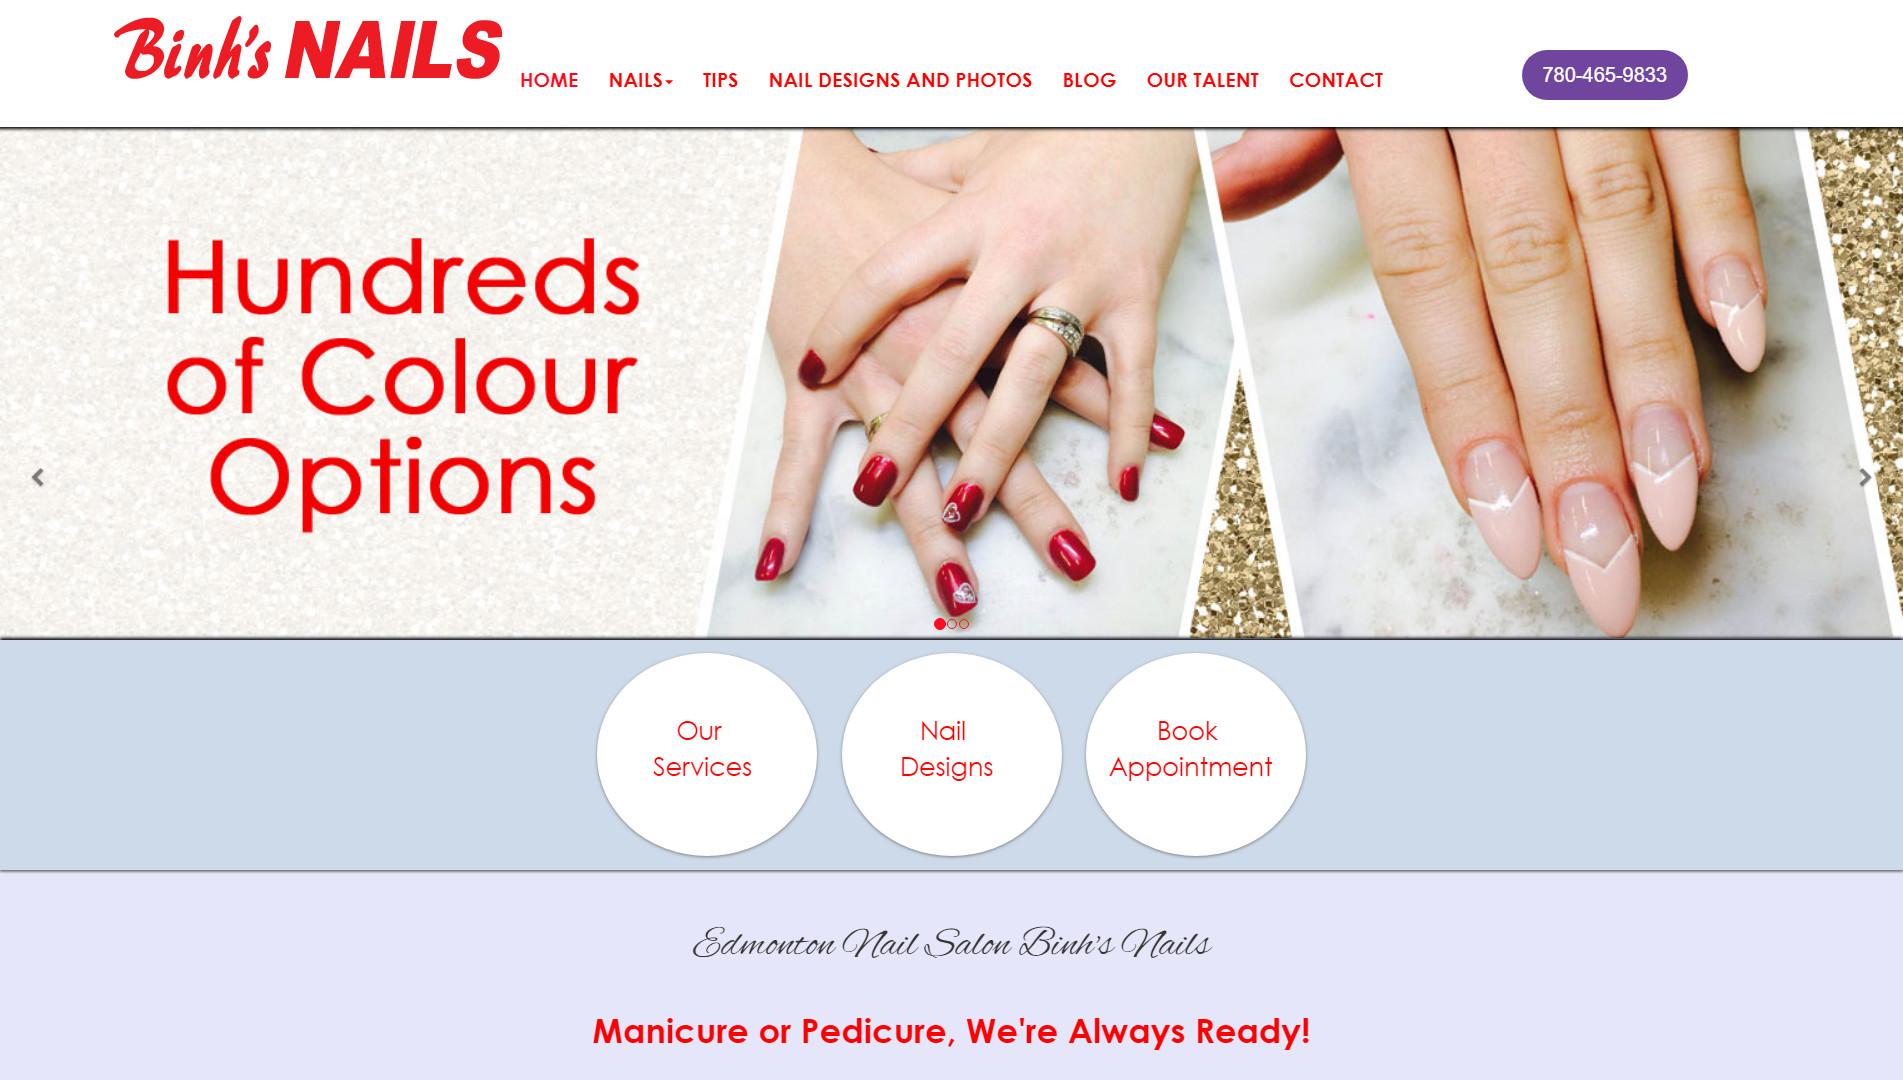 Art nails and spa edmonton